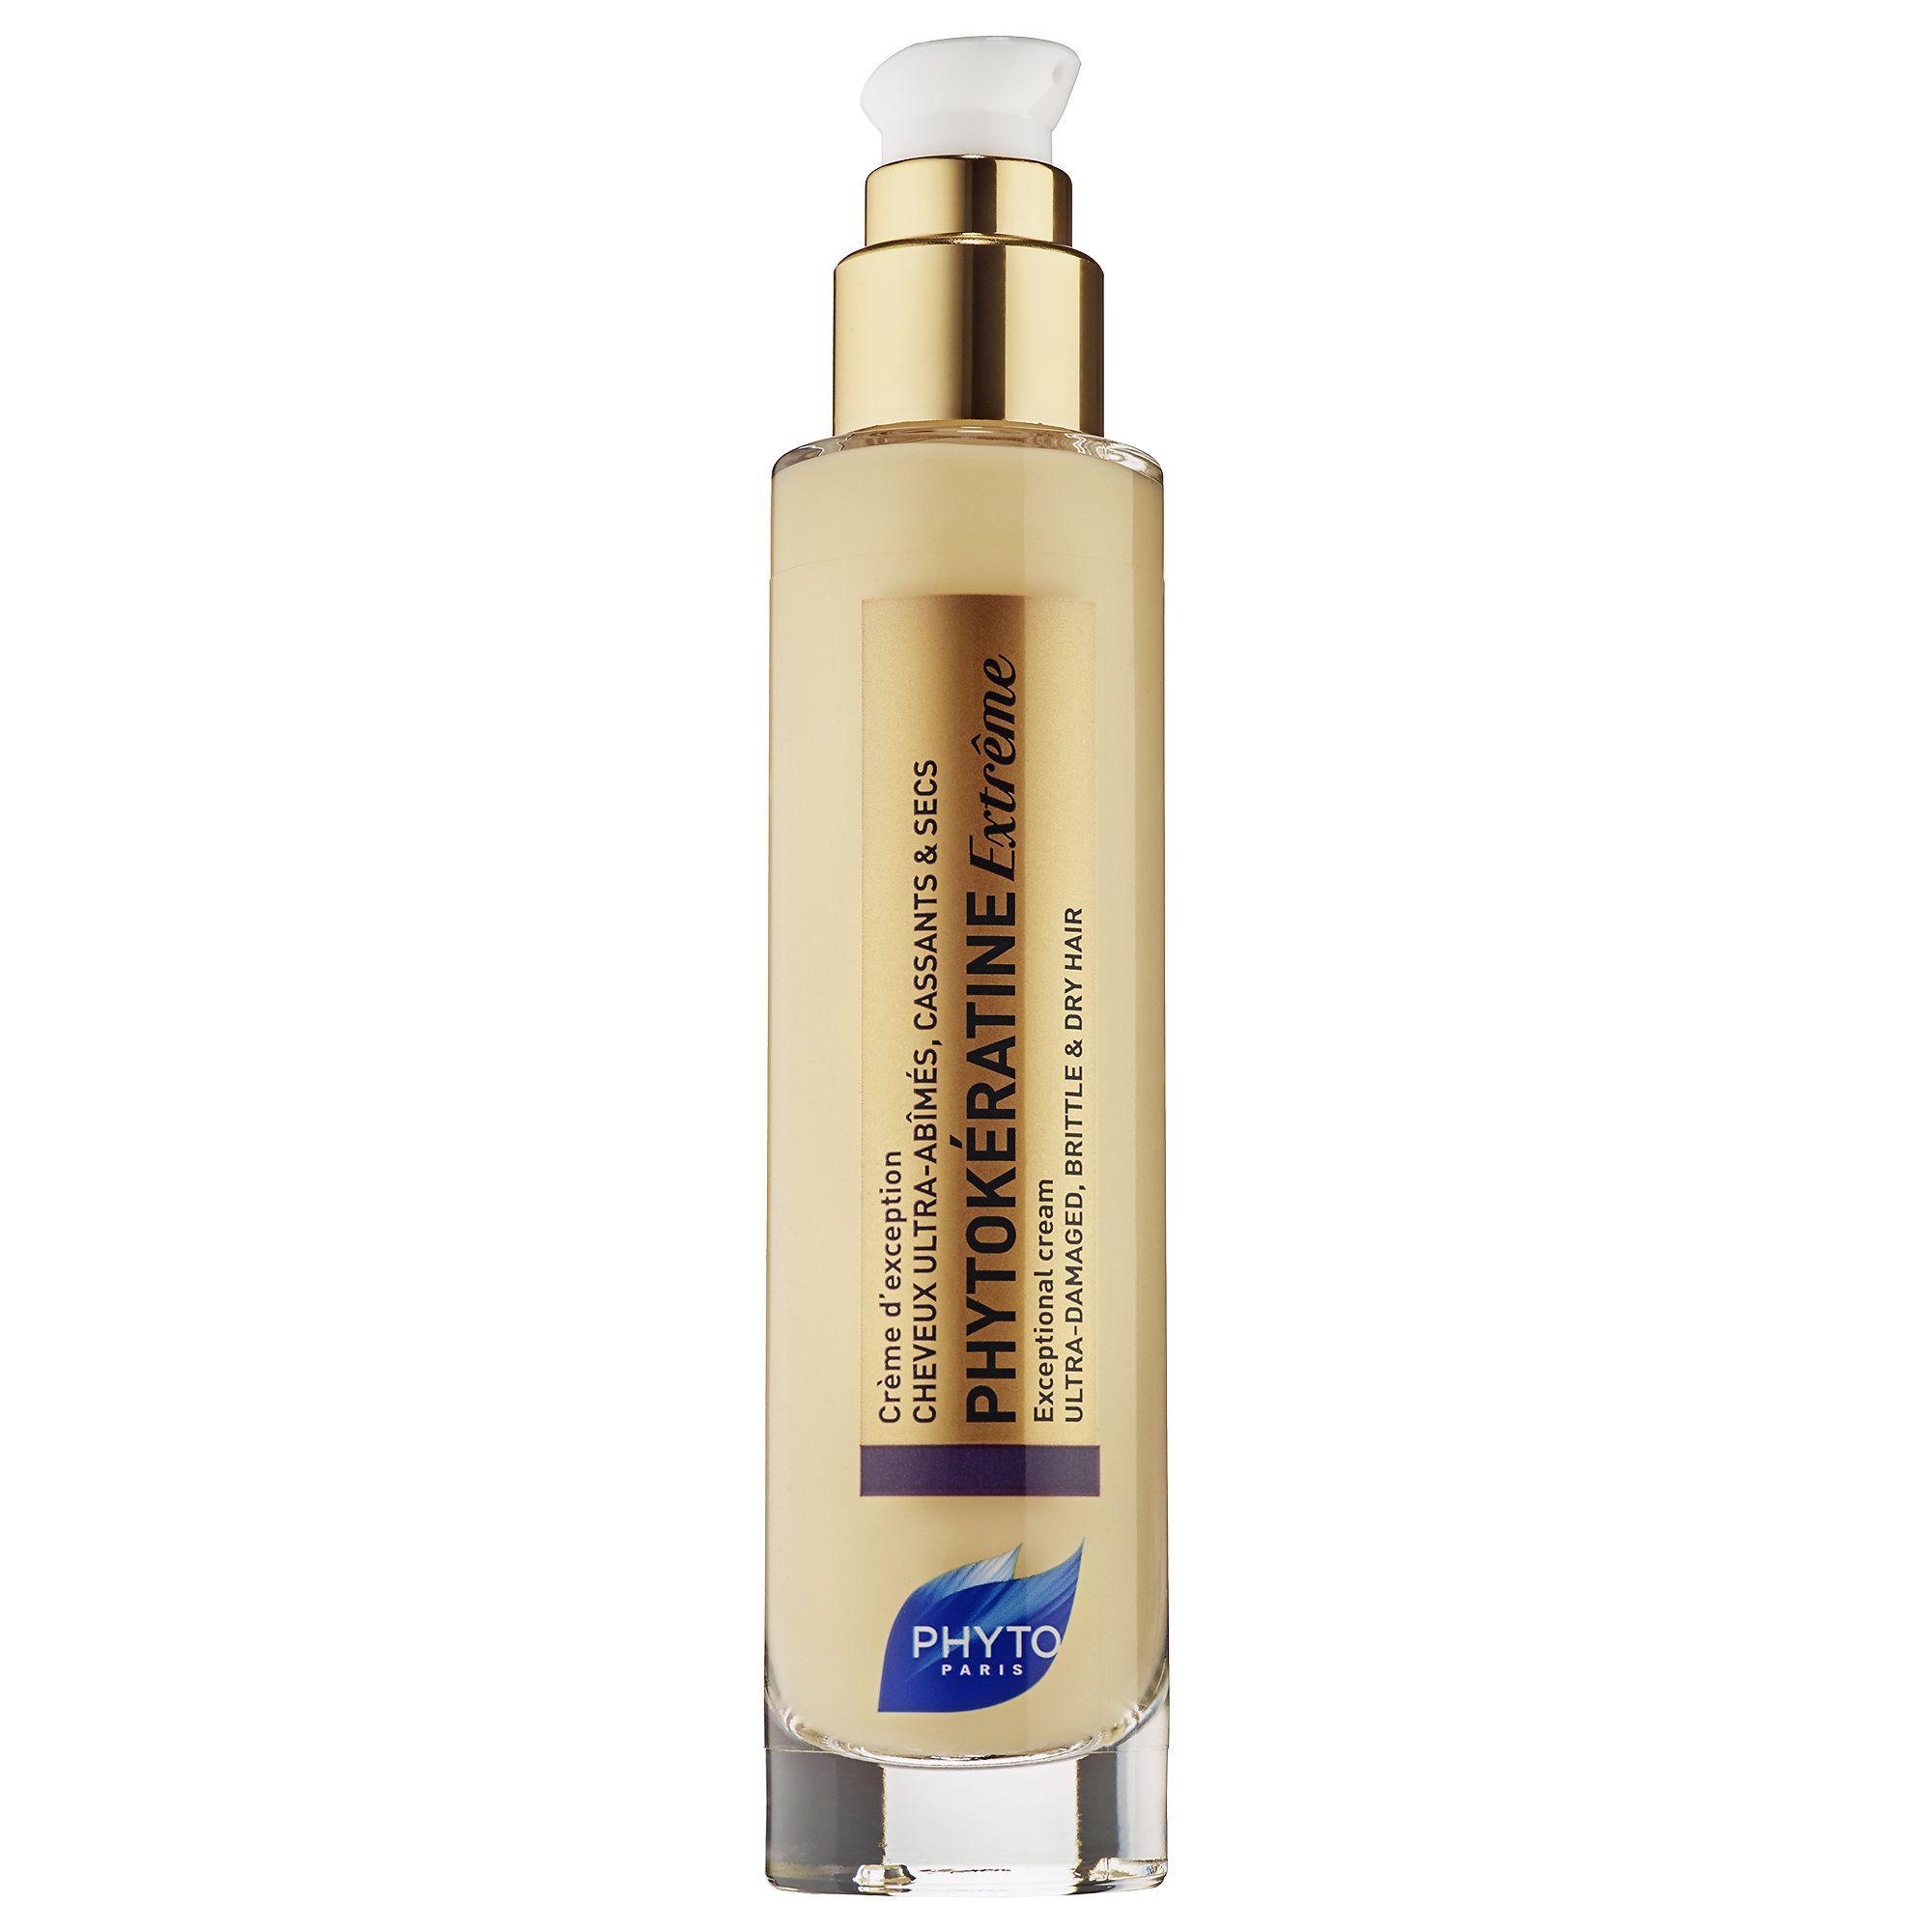 Phytokératine Extrême Exceptional Cream Phyto Sephora